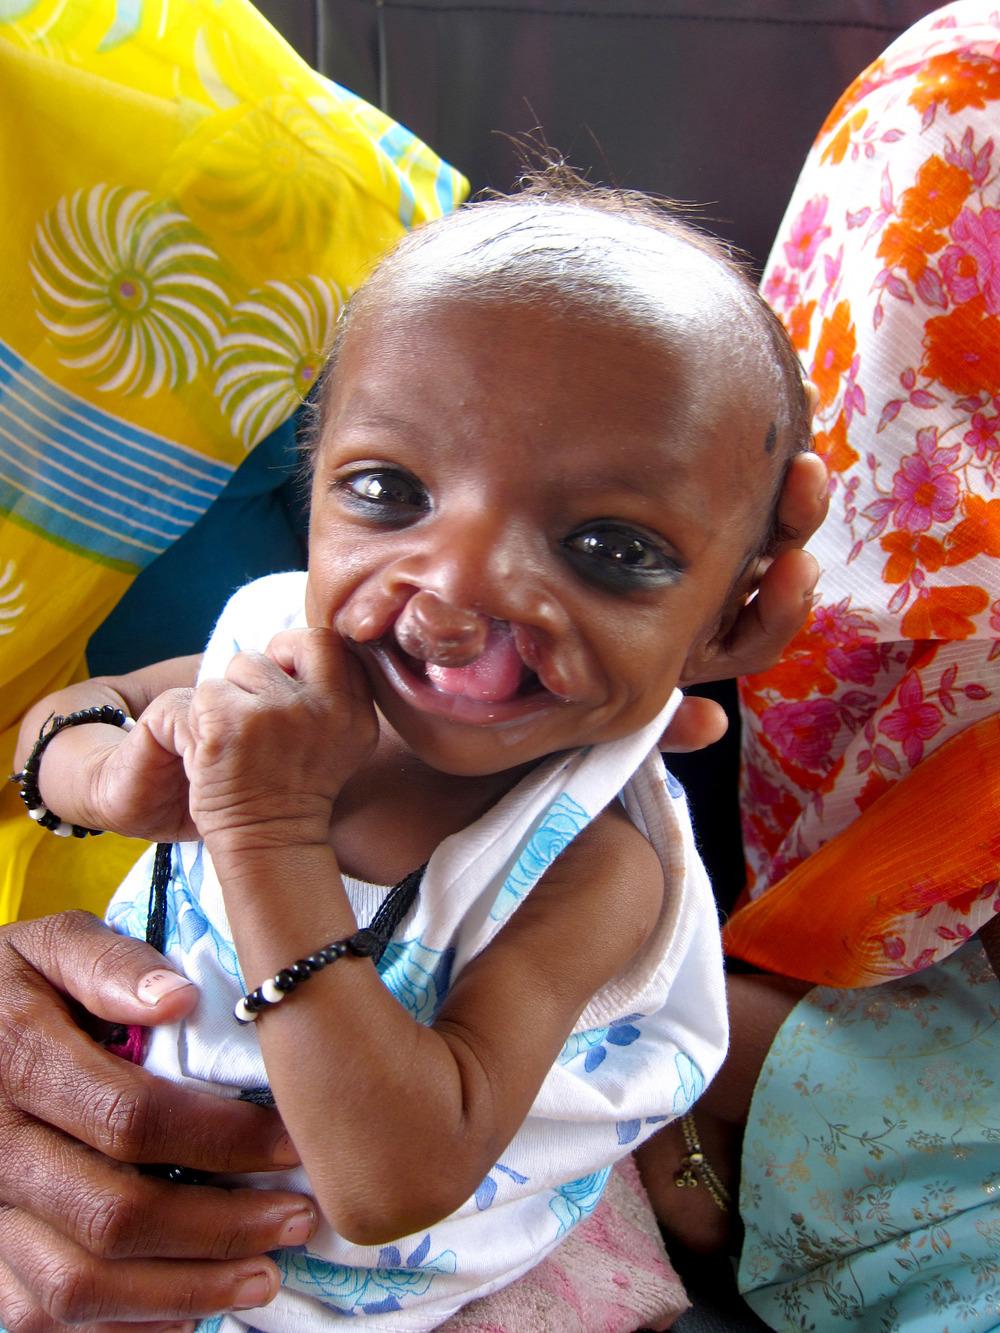 Santosh, Born December 23, 2011 - Deceased January 12, 2013